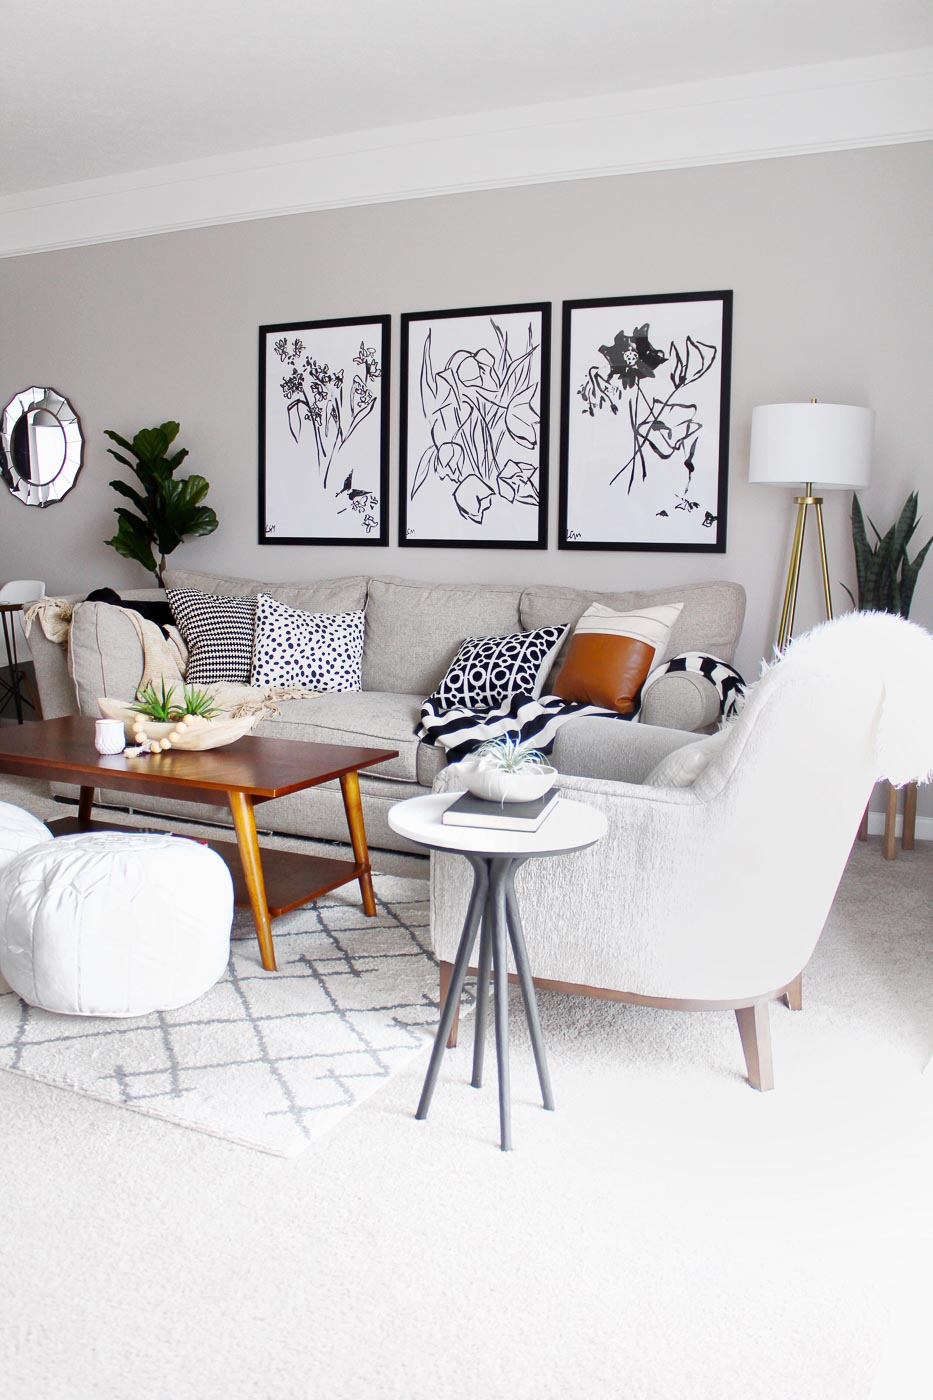 cozy-quarters-ohio-natural-light-photography-studio-lifestyle-photographer-9.jpg